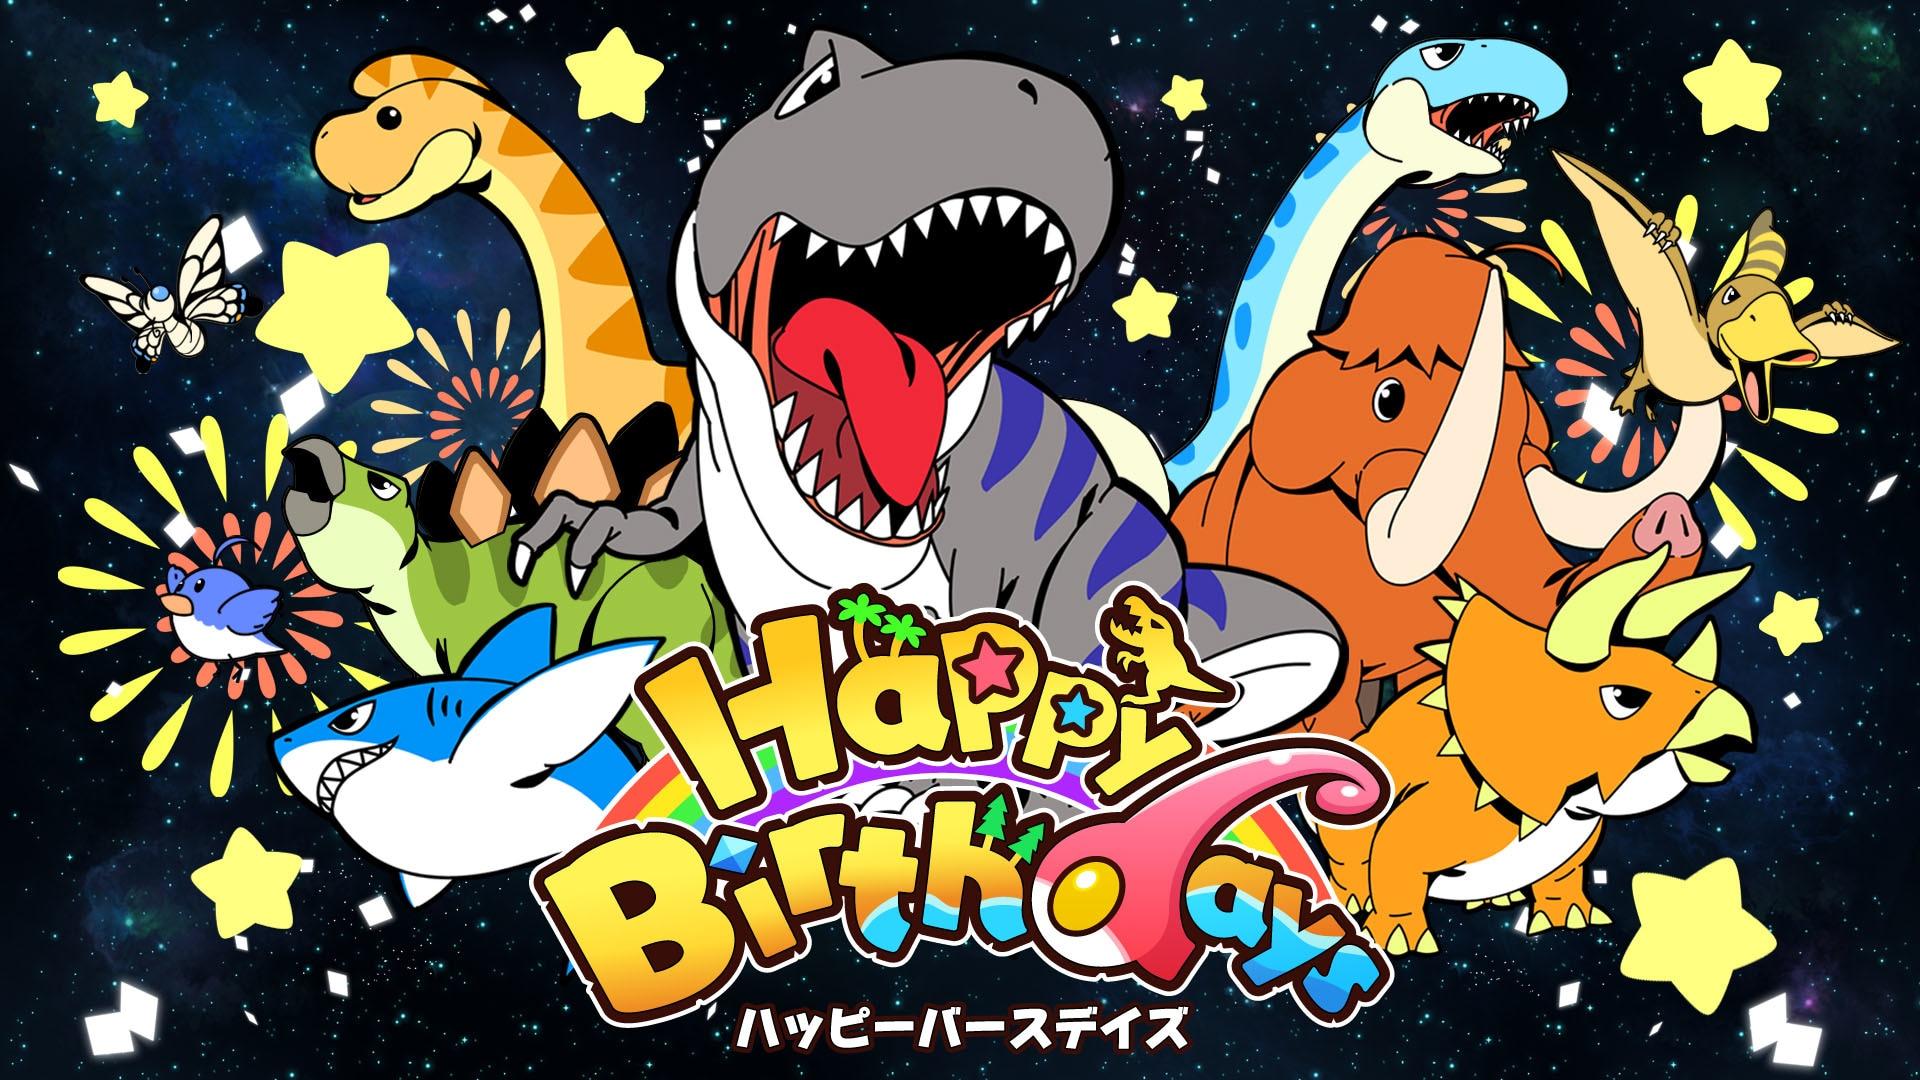 Happy Birthdays ハッピーバースデイズ